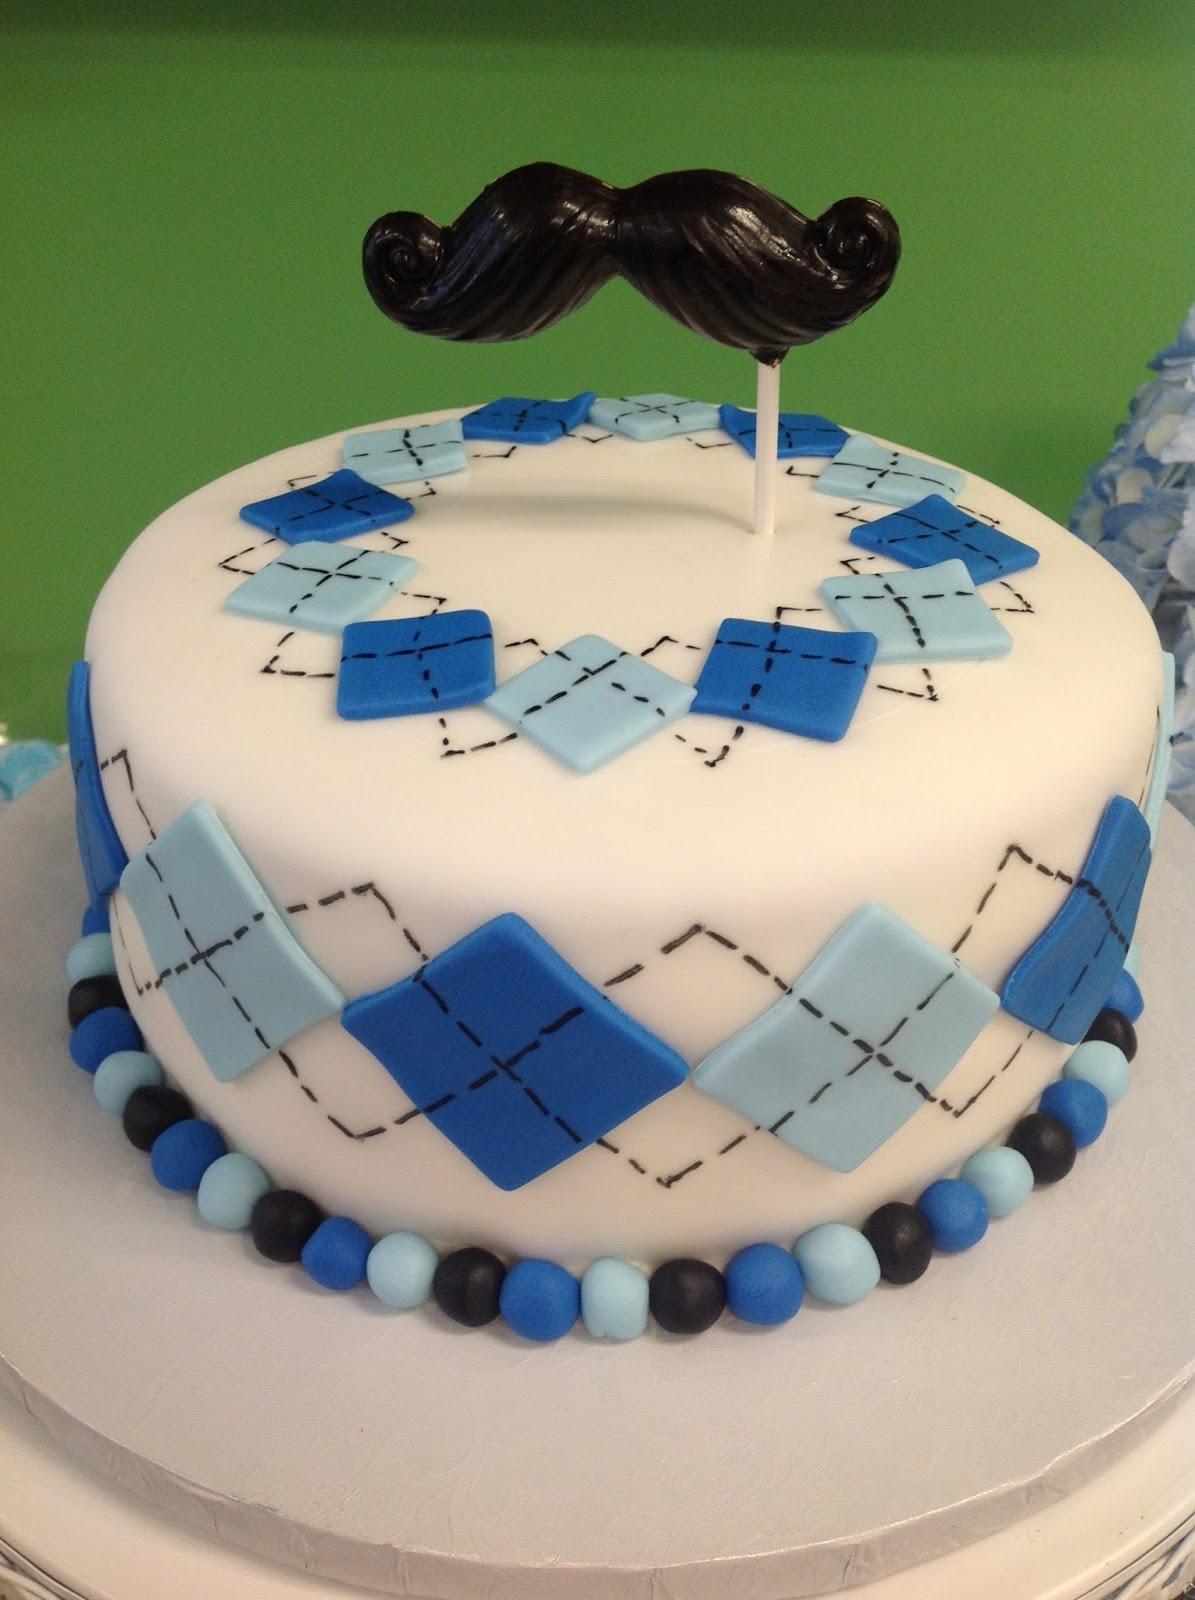 Plumeria Cake Studio Mustache Cake and Cupcakes